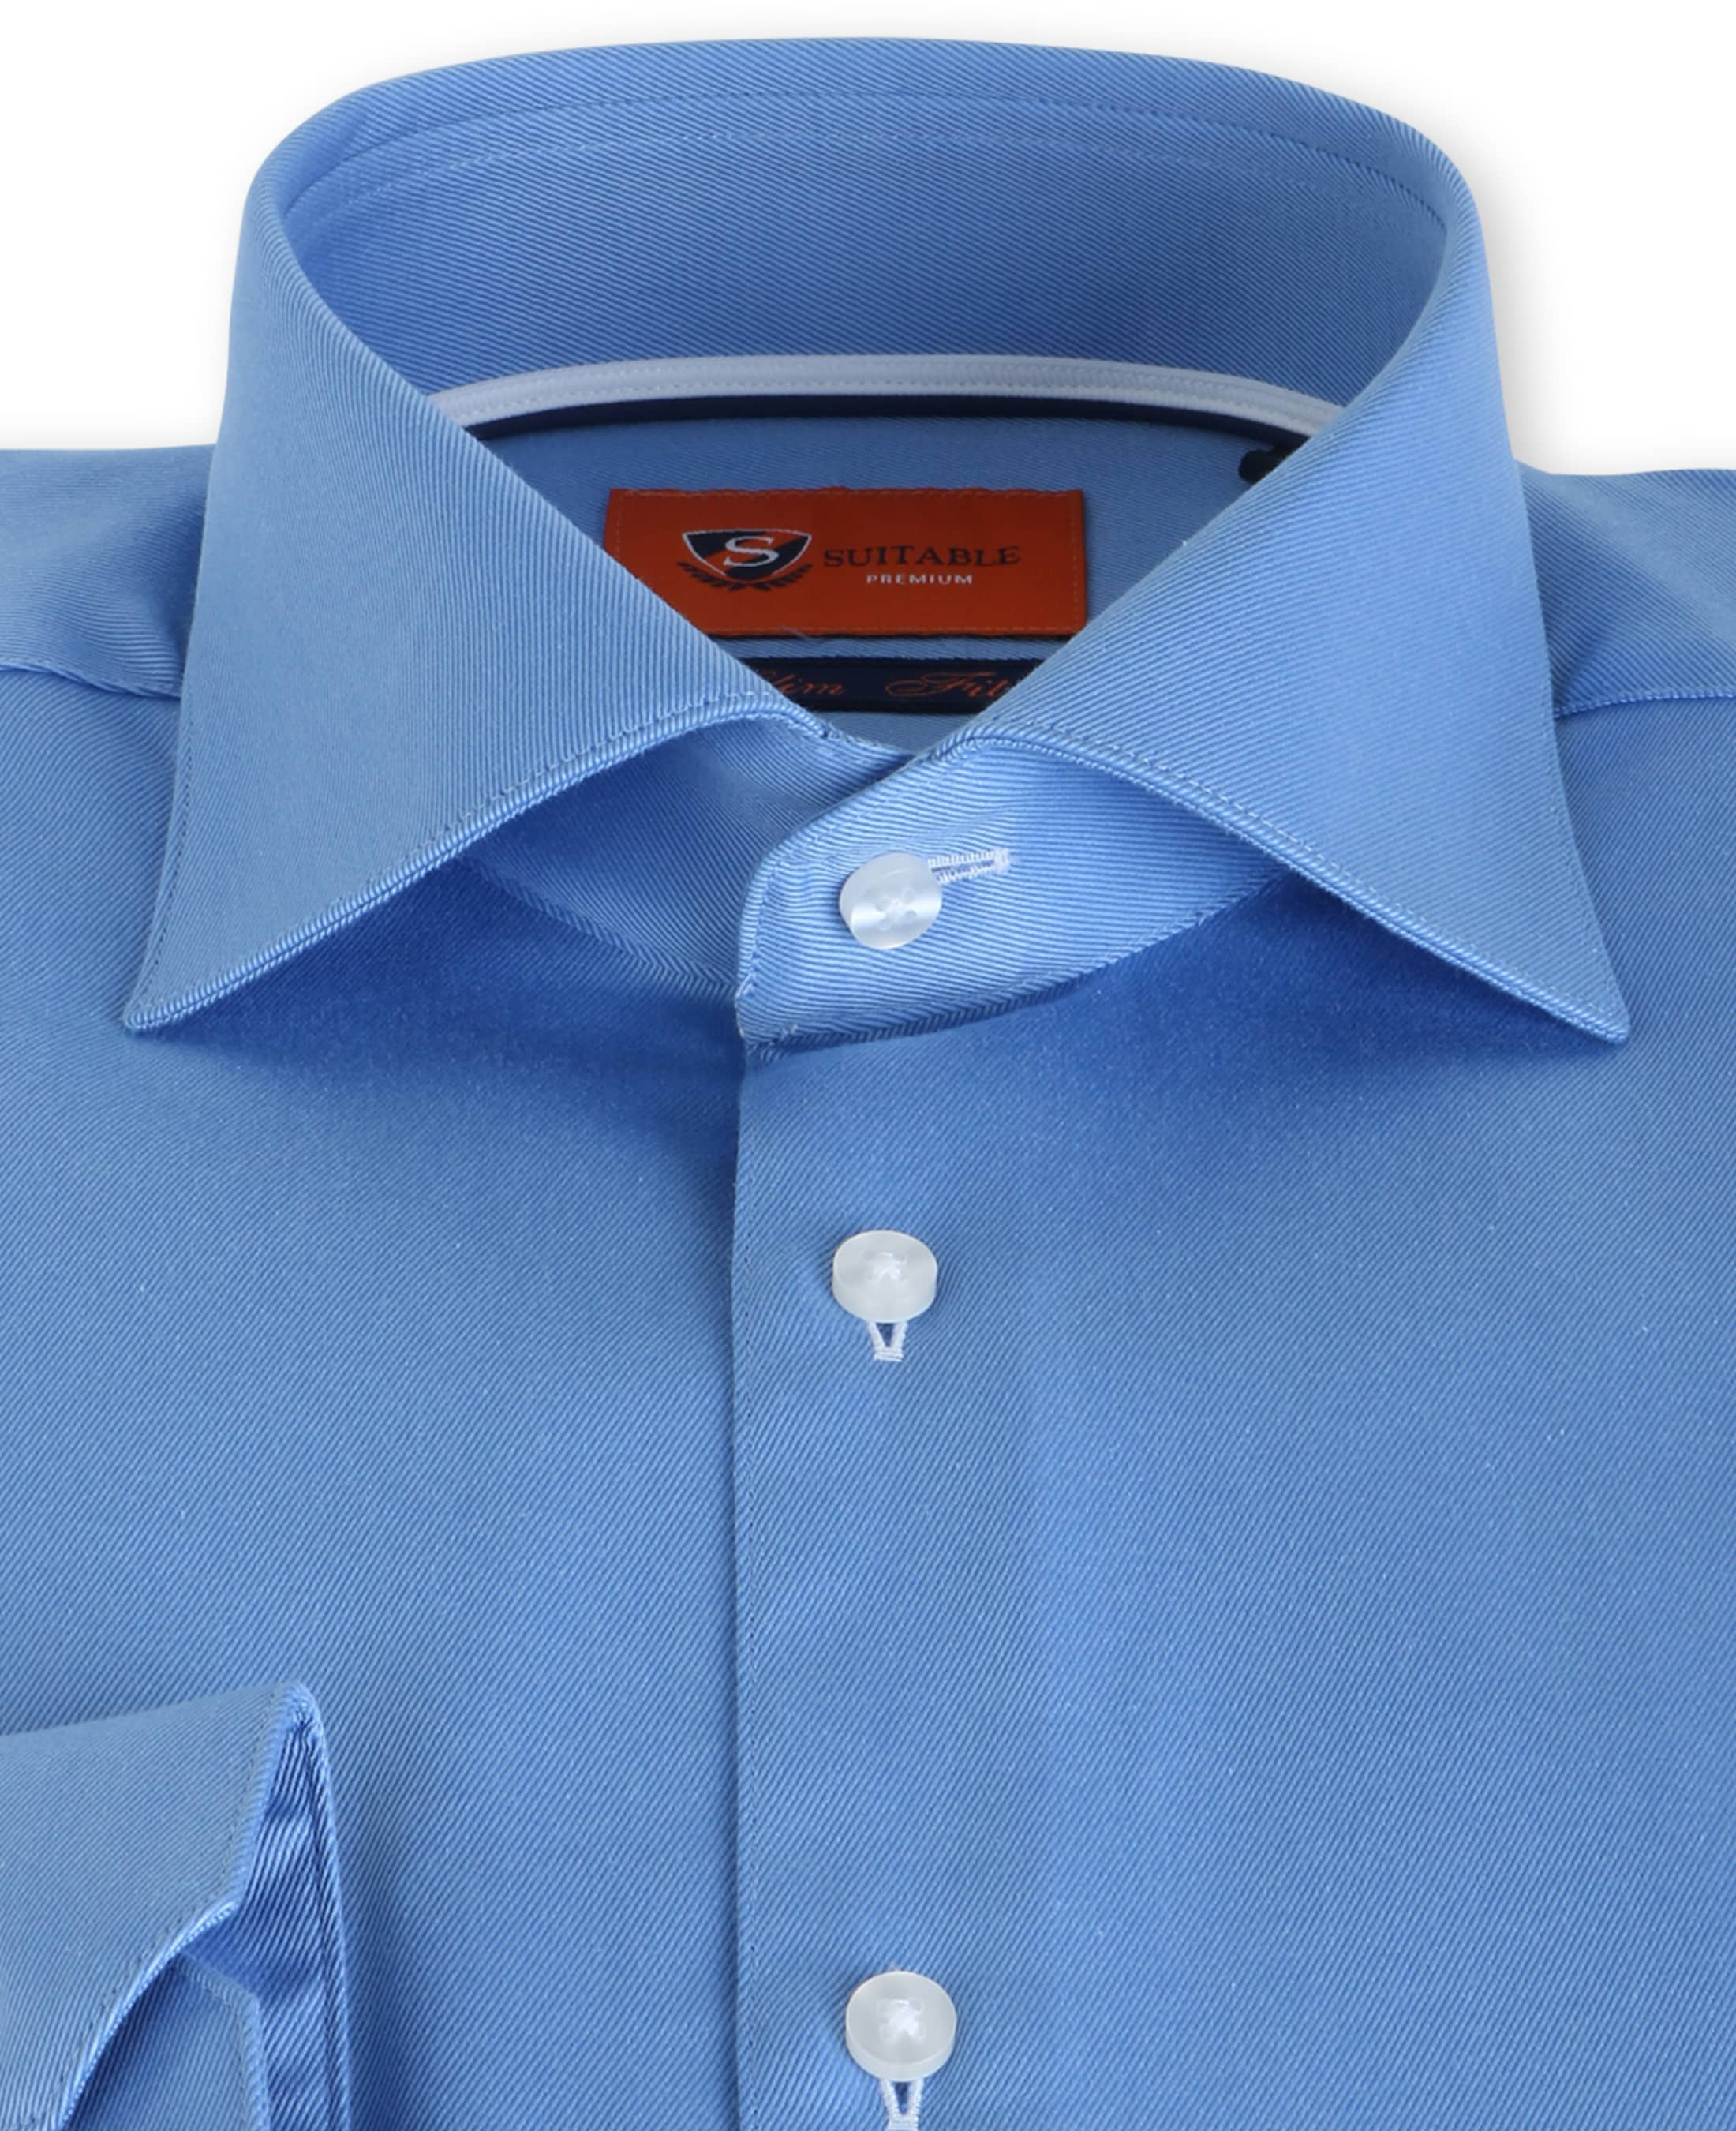 Suitable Blauw Overhemd Slim Fit DR-02 foto 2